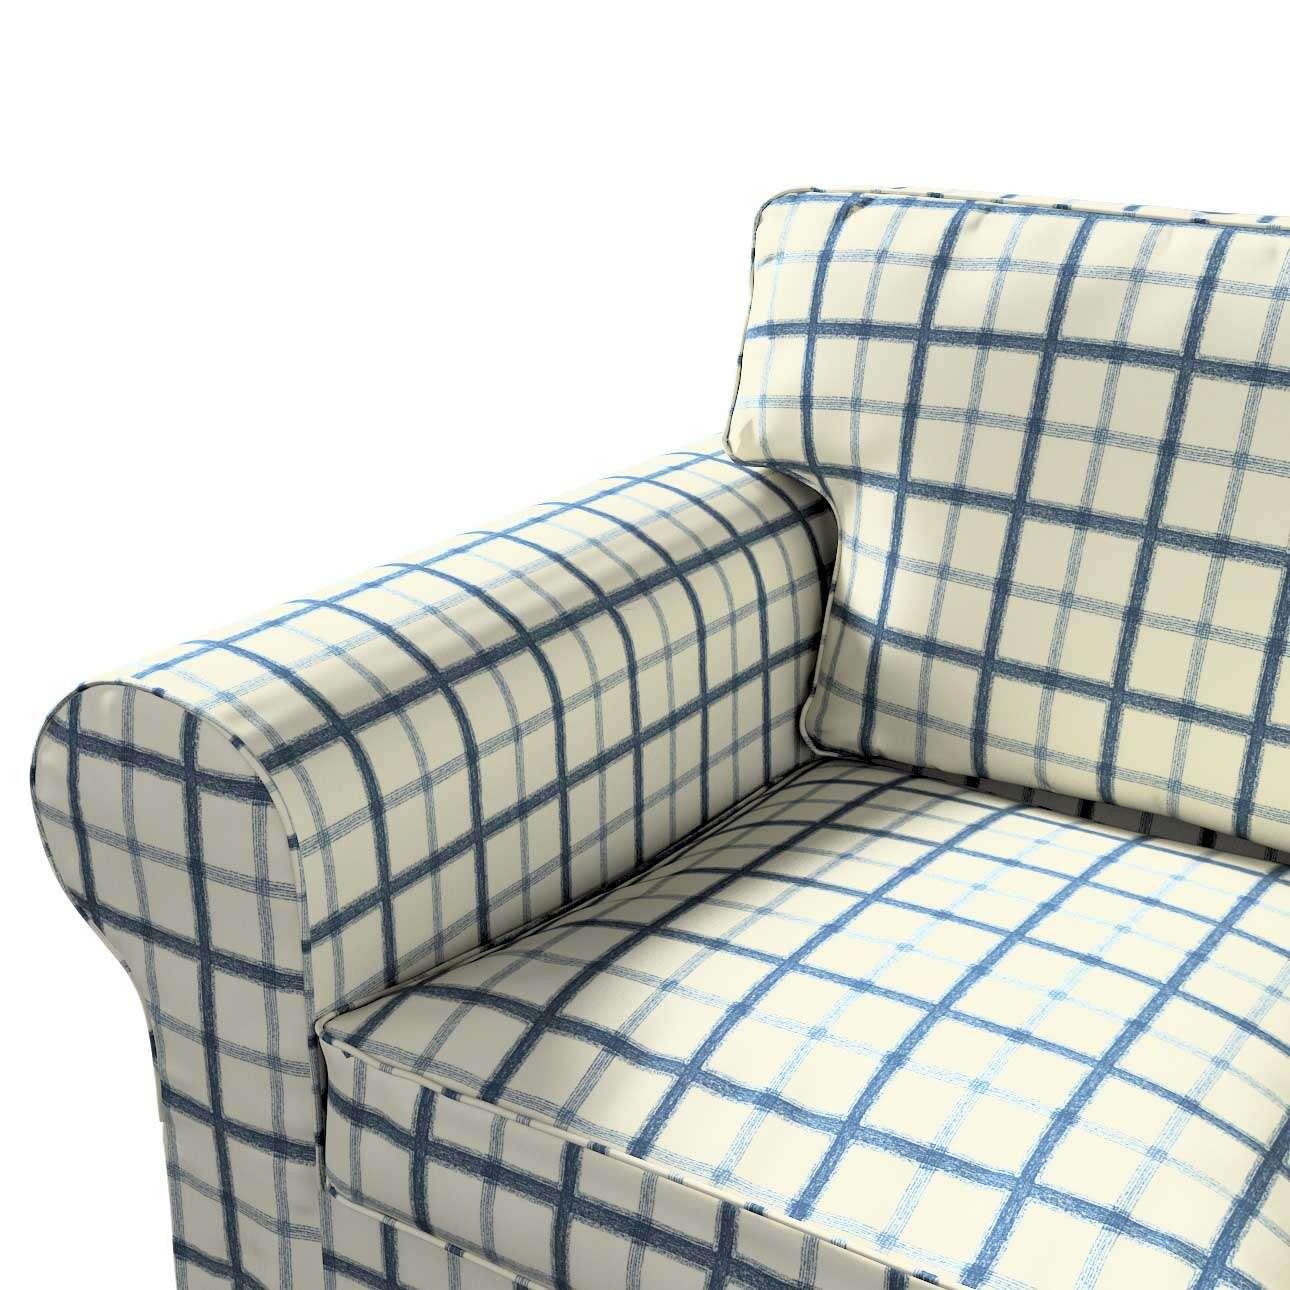 Ektorp 2 sæder sovesofa fra 2012<br/>Bredde ca 200cm fra kollektionen Avinon, Stof: 131-66